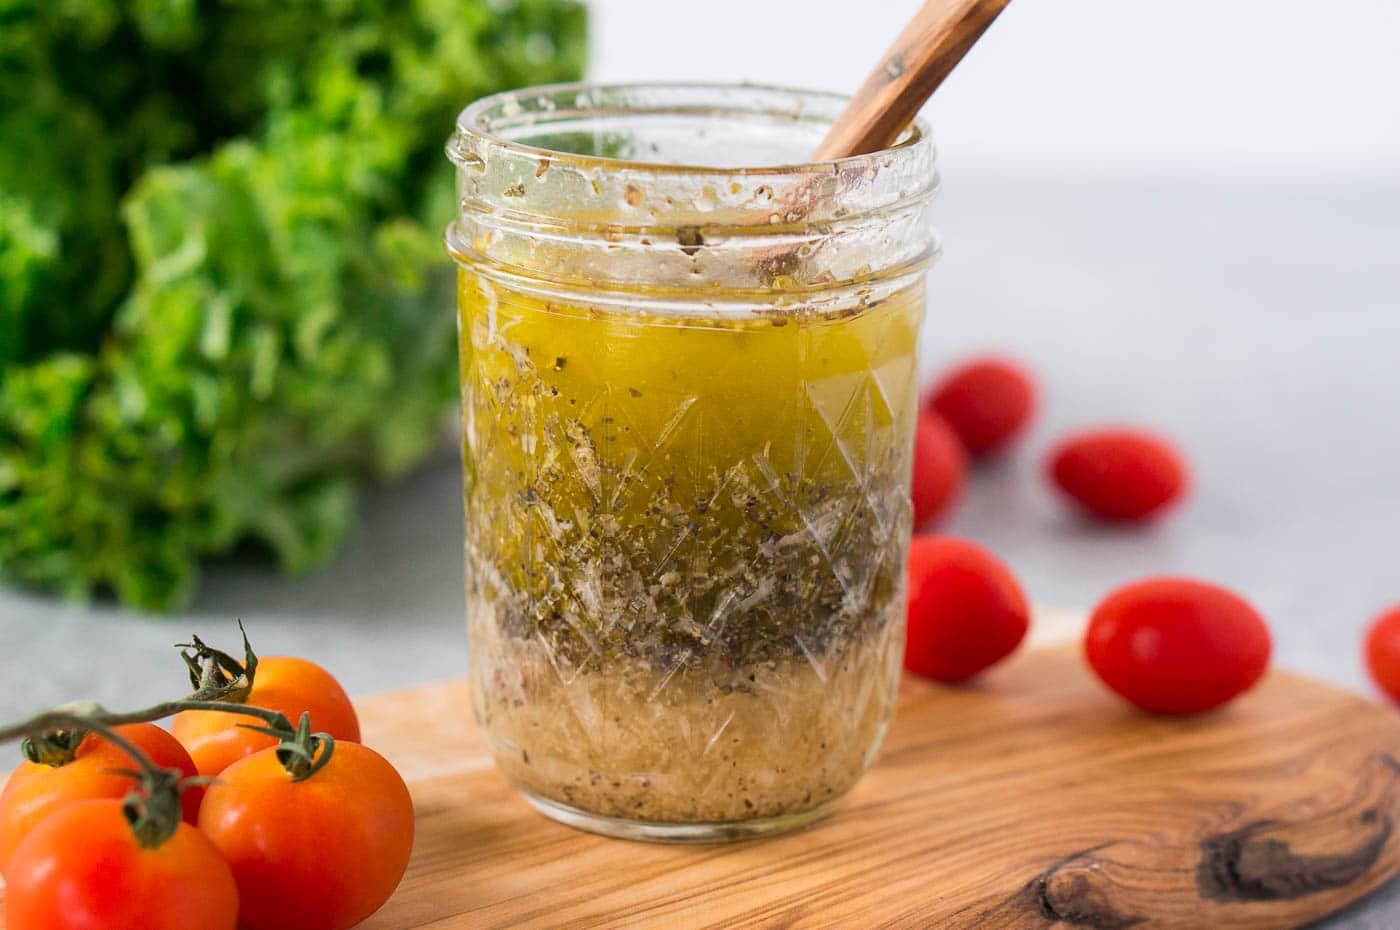 homemade Italian salad dressing in a jar